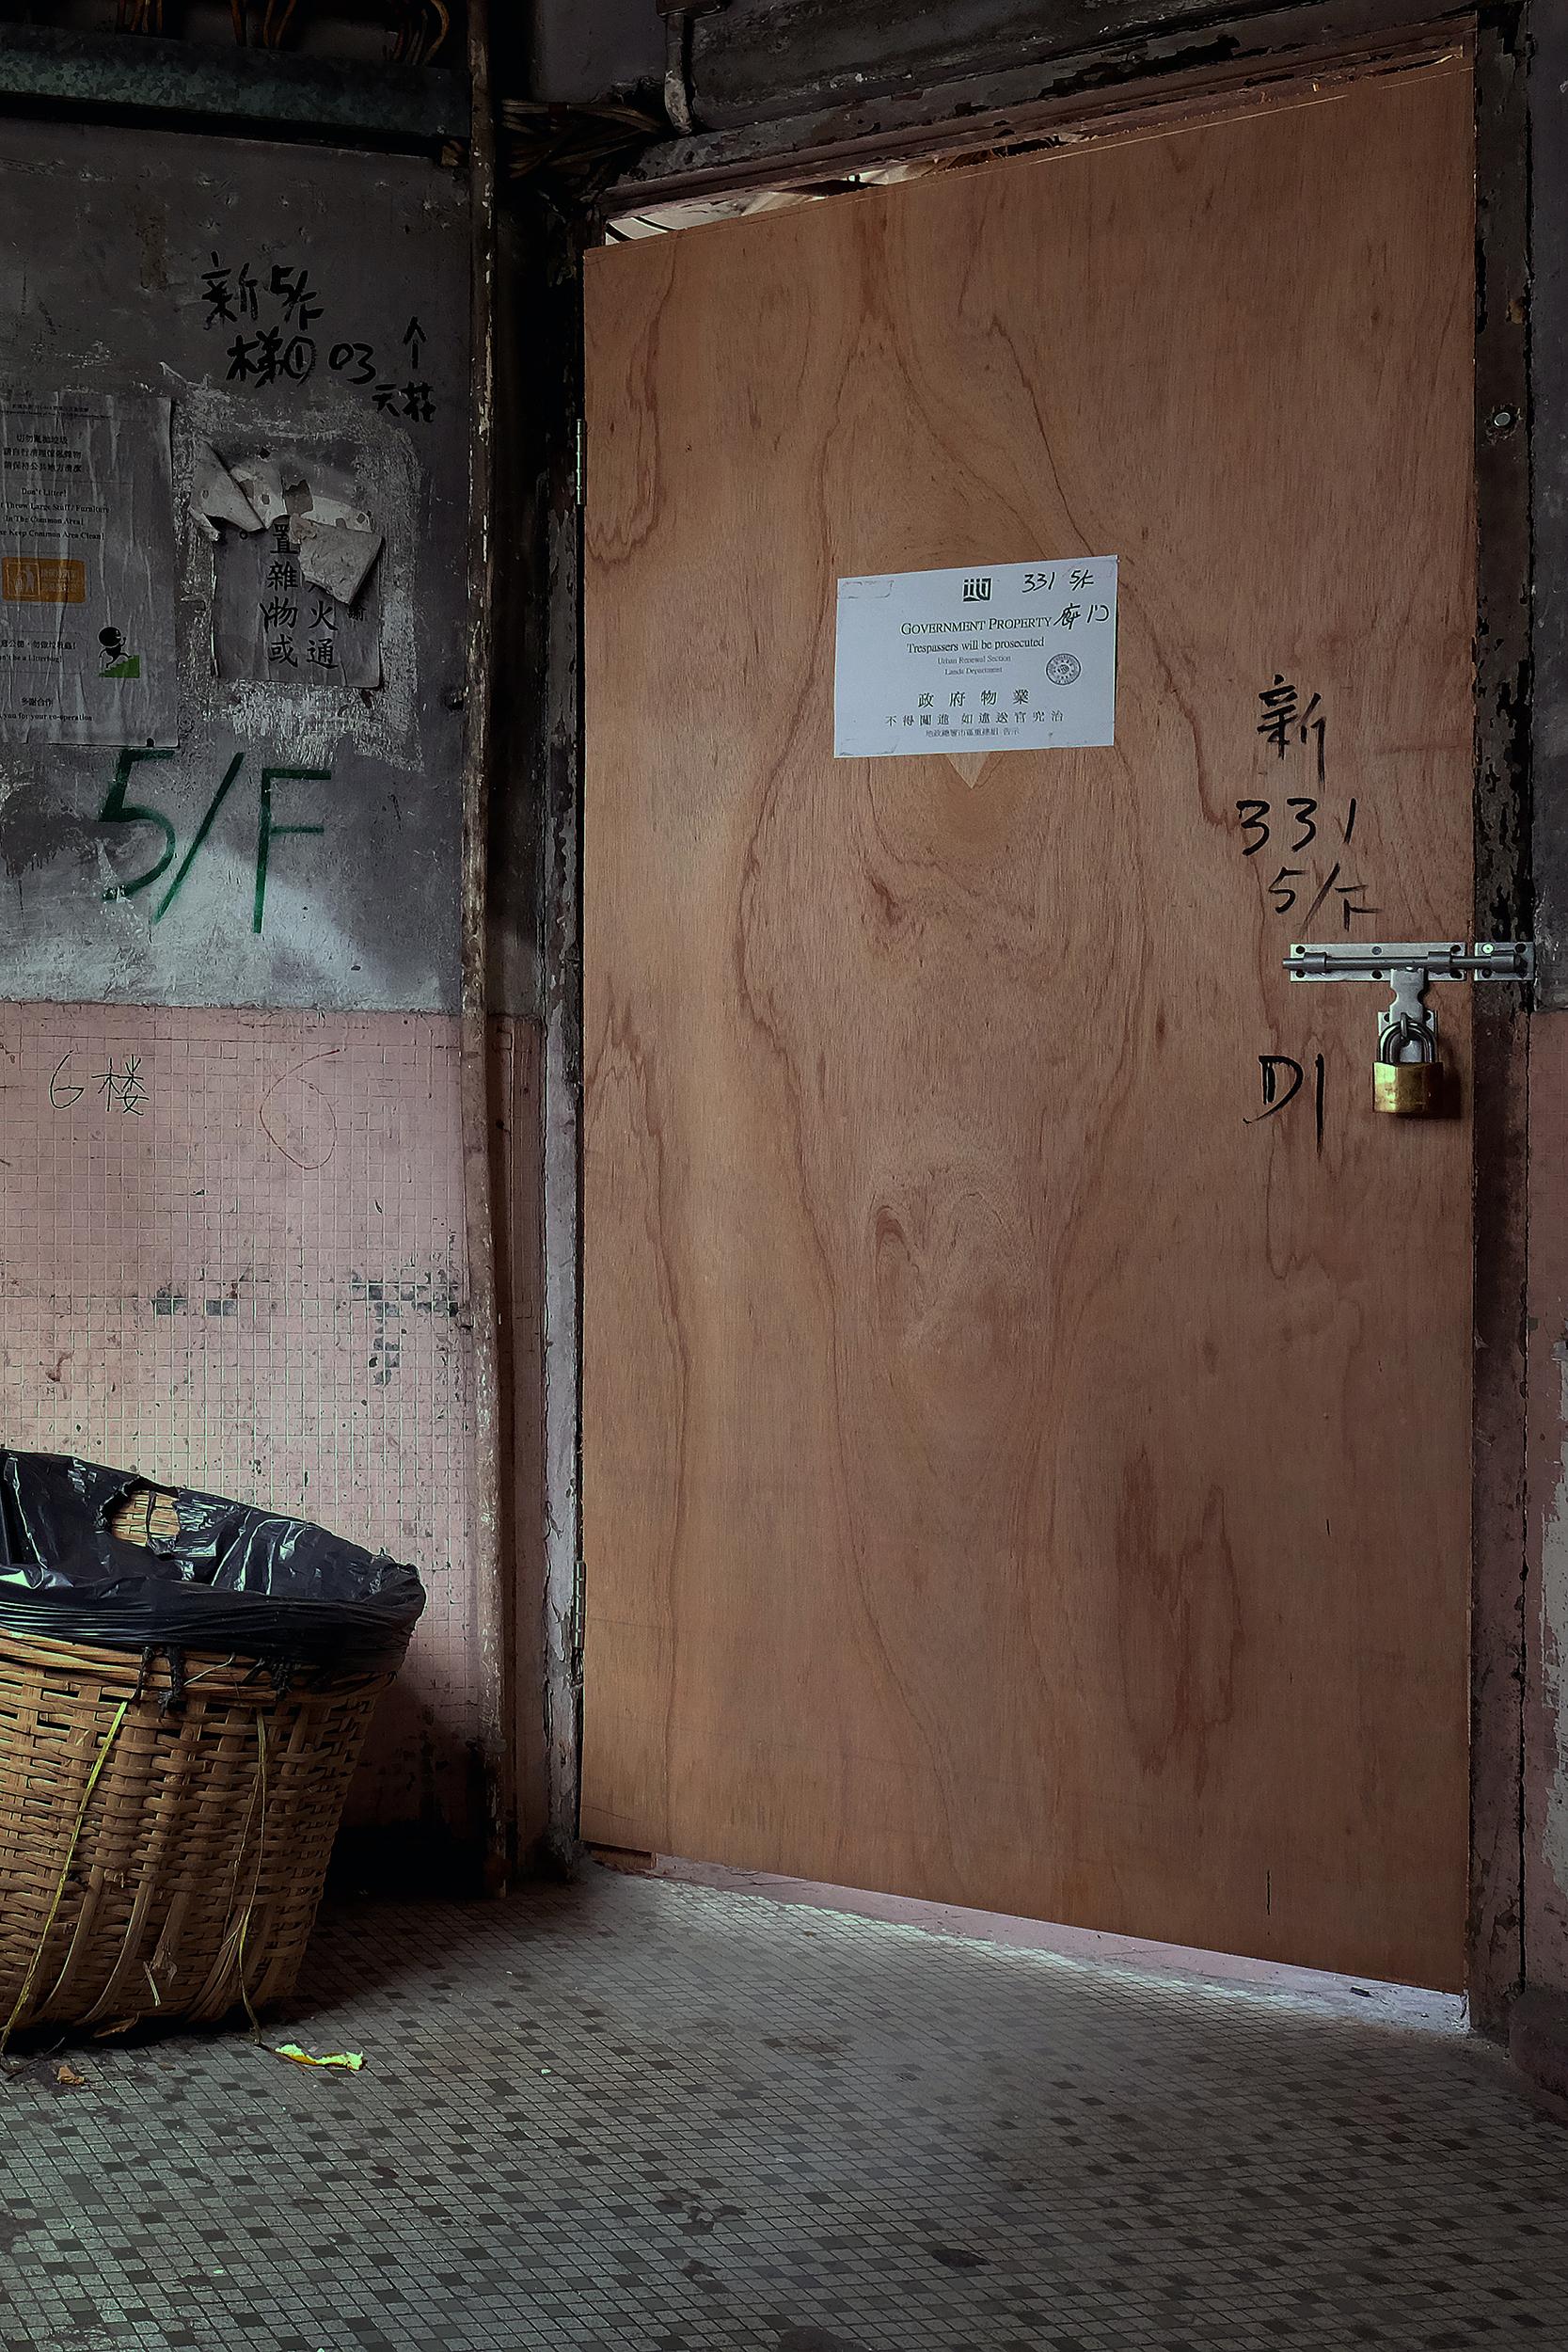 Illegal housing - Els Matthysen